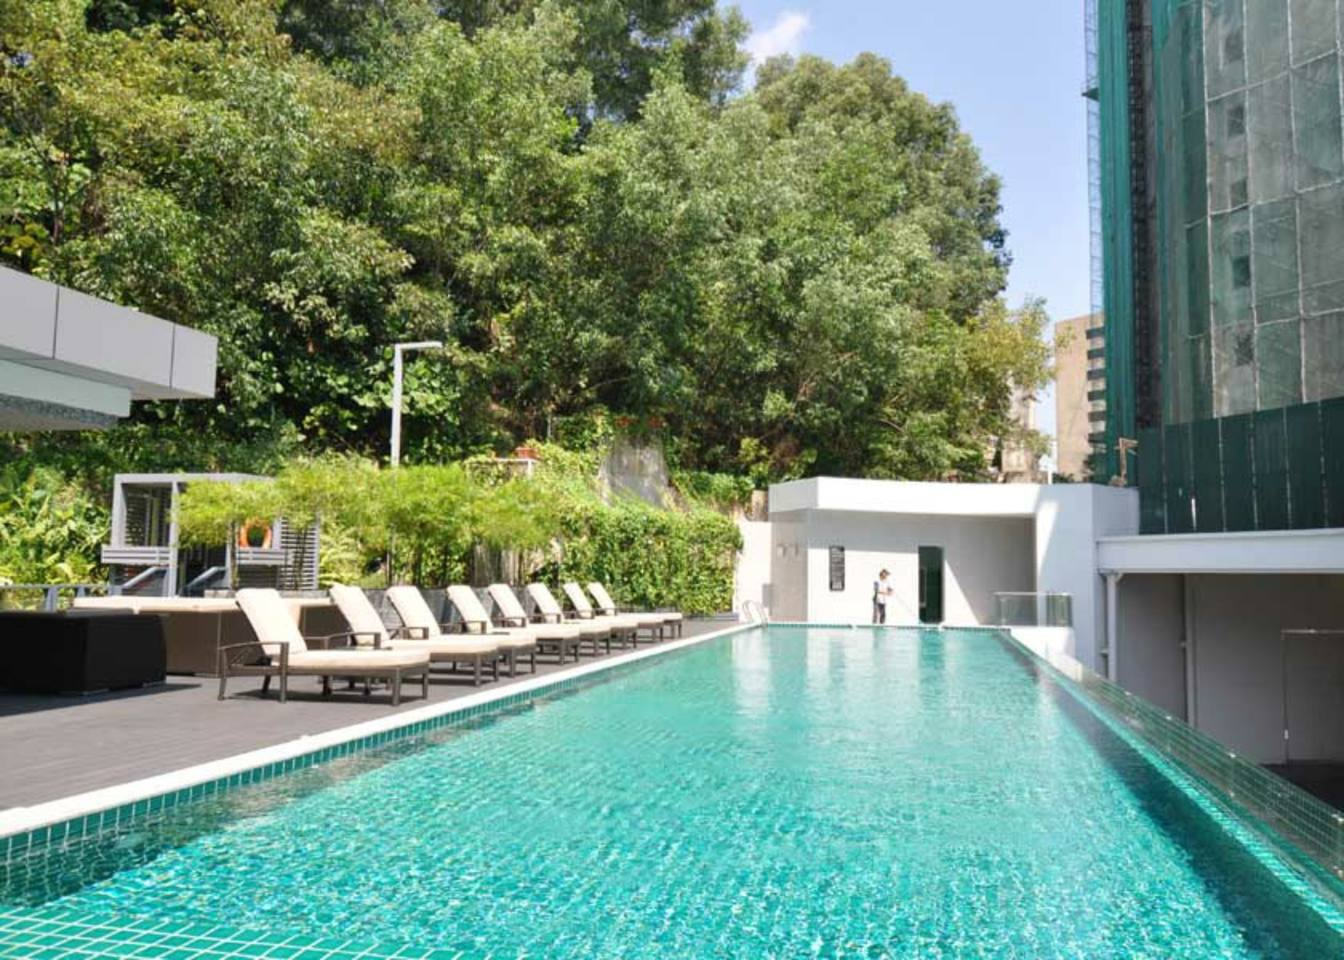 yoga-detox-retreat-kuala-lumpur-swimming-pool.png